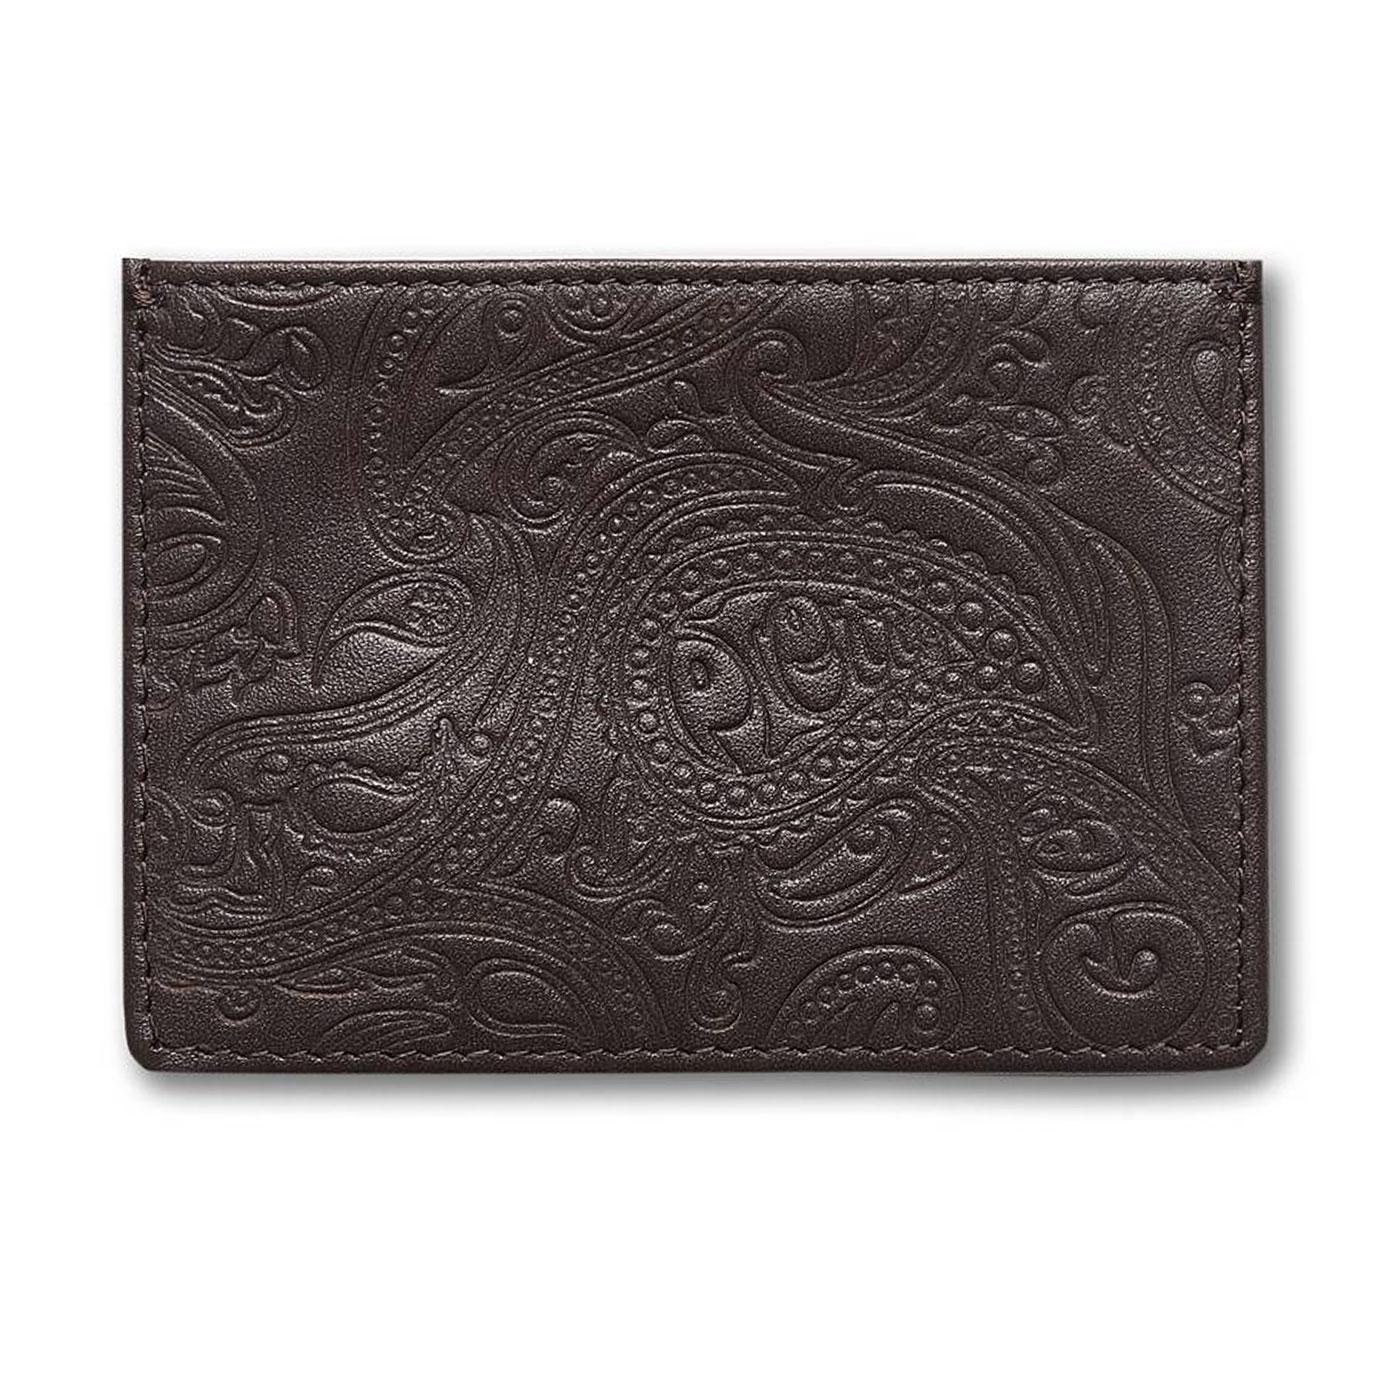 PRETTY GREEN Paisley Embossed Card Holder (Choc)